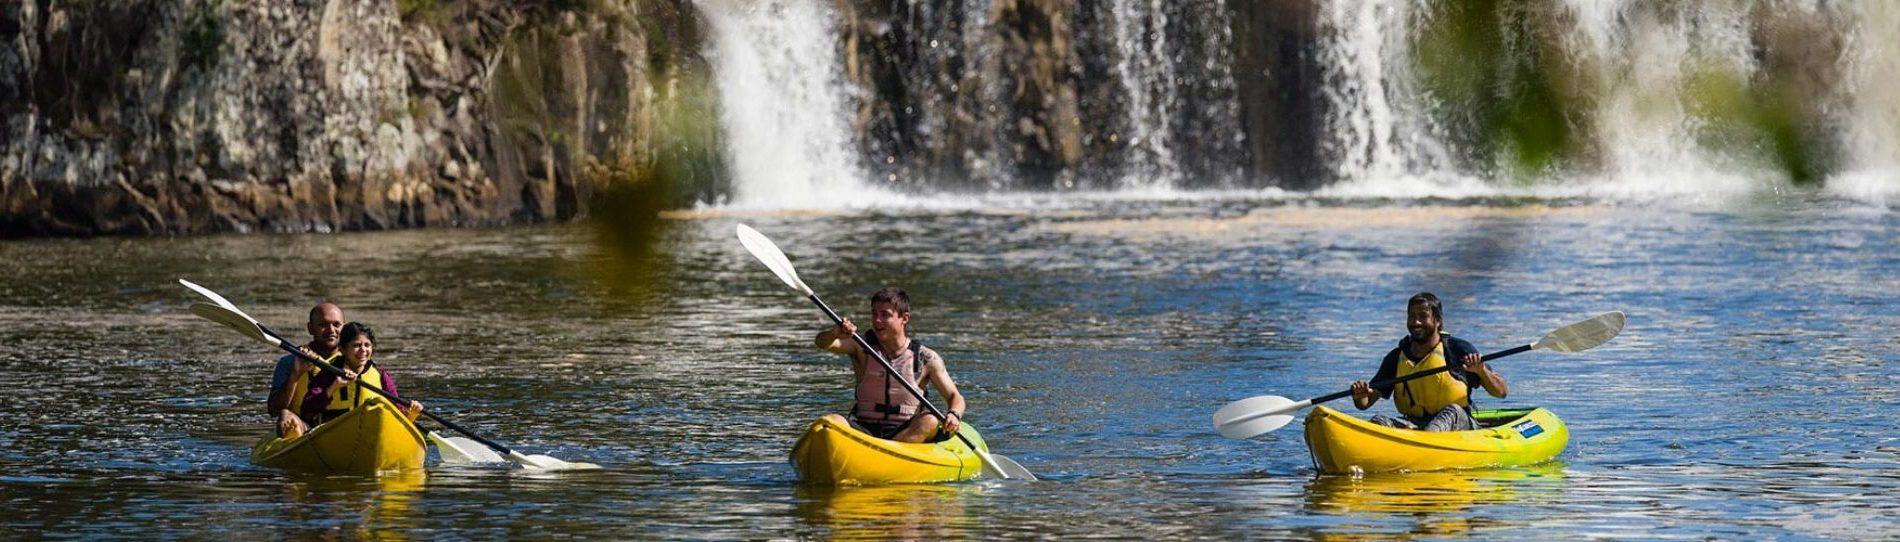 kayaking bay of islands nz